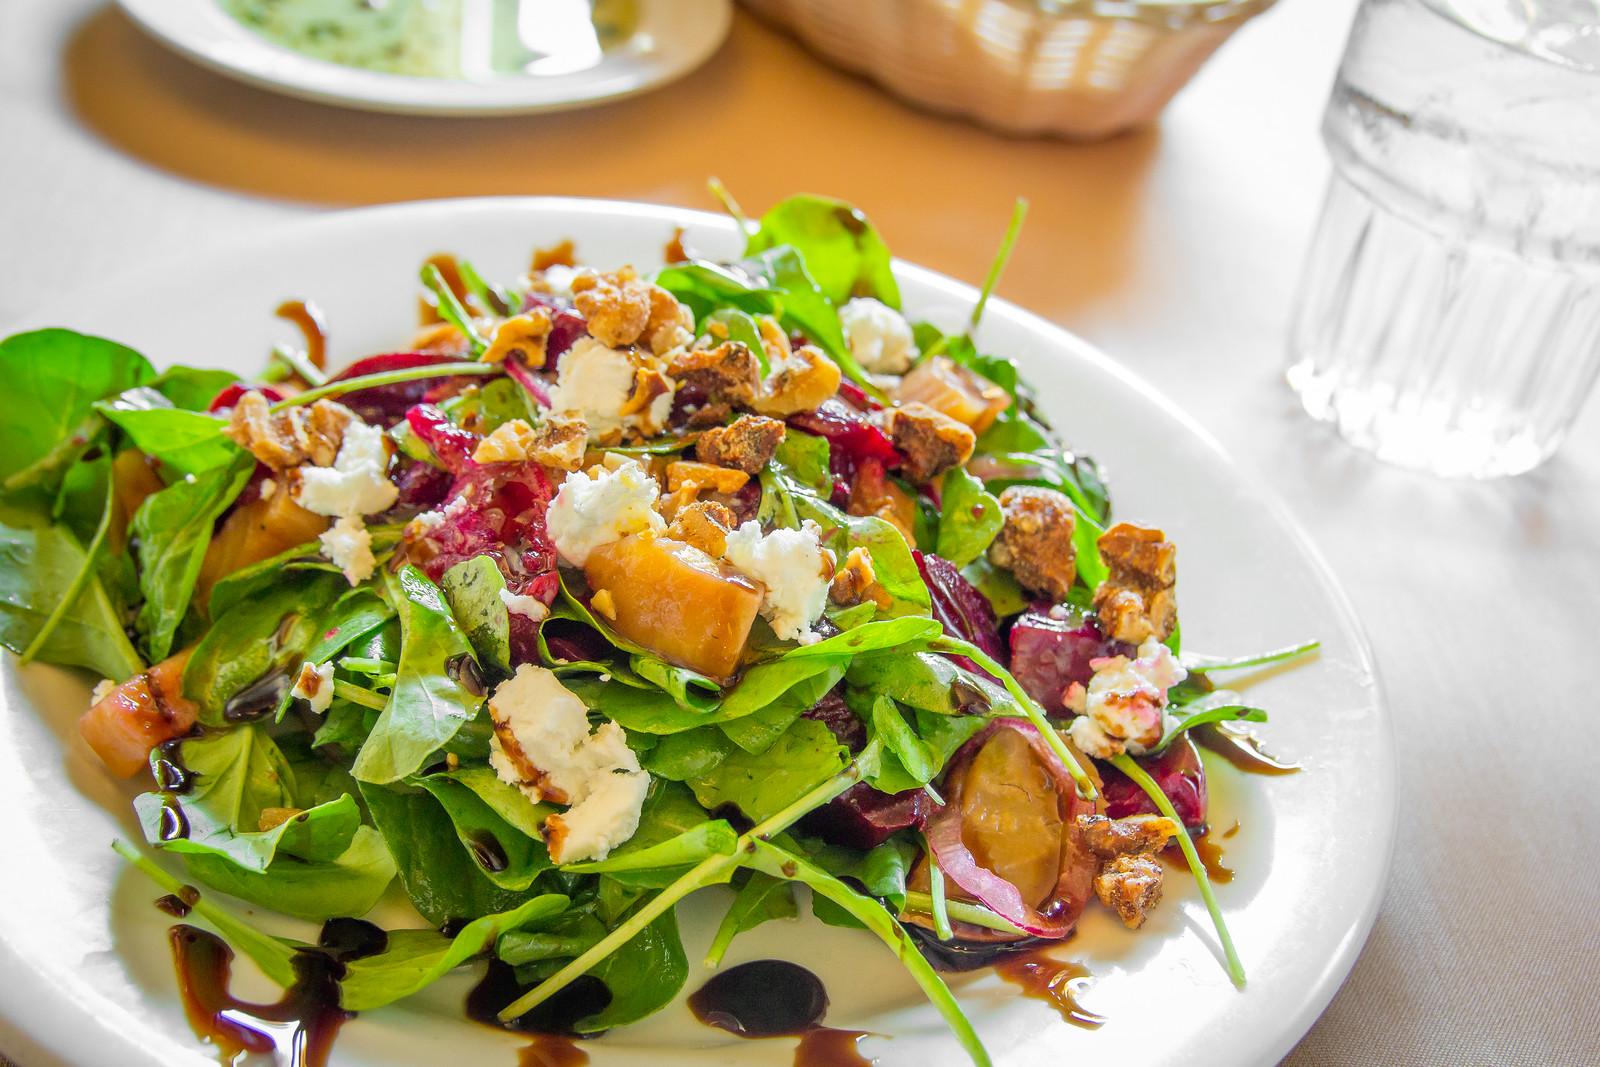 beet salad 08.21.15.jpg